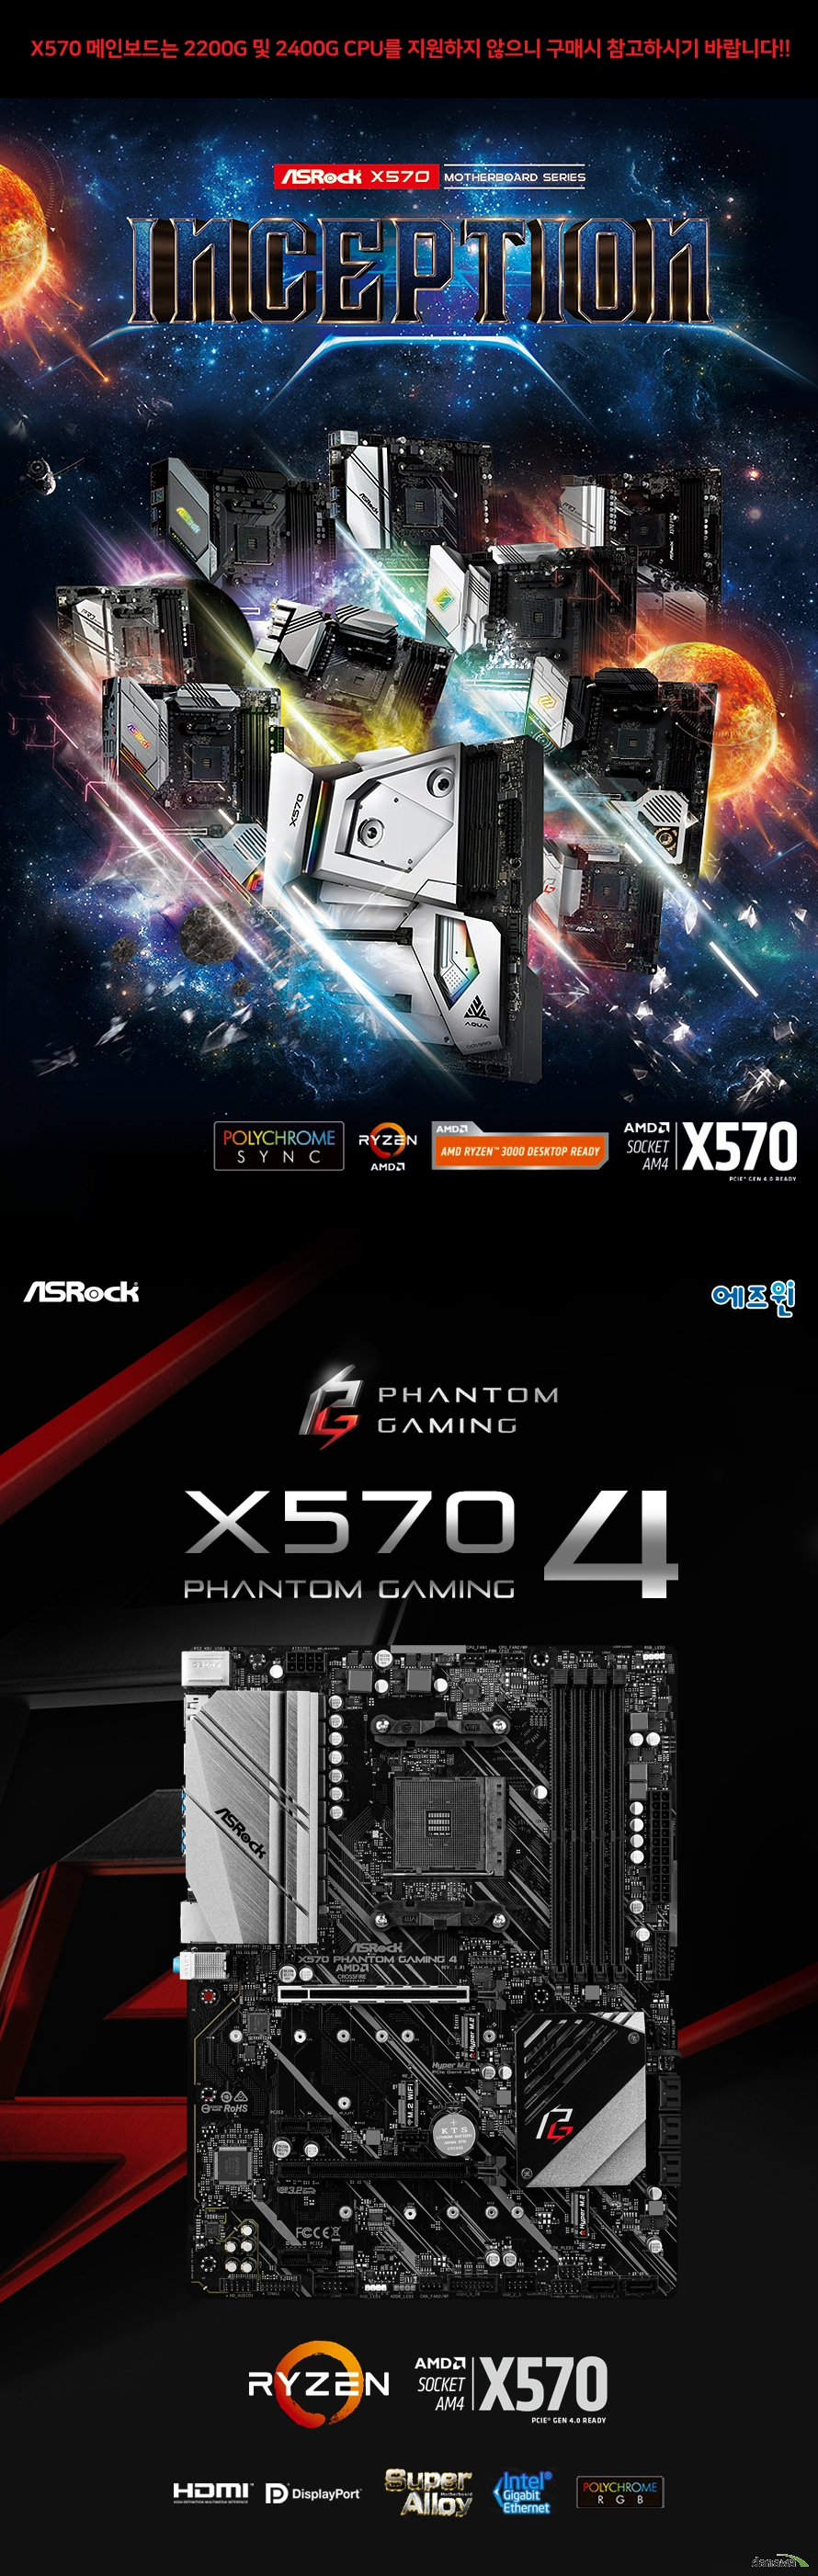 ASRock X570 Phantom Gaming 4 에즈윈  제품 상세 스펙  AMD am4 소켓 라이젠 2000 및 3000 시리즈 프로세서 지원 인터실 디지털 PWM  10파워 페이즈  Amd x570칩셋 적용  듀얼채널 ddr4 메모리 최대 128기가바이트 지원  Amd 라이젠 마티즈 cpu  Ddr4 4066+ 3466 3200 2933 2667 2400 2133 ecc 및 non ecc un buffered memory 지원  32비트 운영체제환경에서는 실제 메모리 사이즈가 4기가바이트 이하로 인식될 수 있습니다.  확장 슬롯  Amd 라이젠 마티즈 cpu  Pcie 4.0 16배속 슬롯 2개 지원   Amd 라이젠 피나클릿지 및 피카소 cpu Pcie 3.0 16배속 슬롯 2개 지원 Pcie 4.0 1배속 슬롯 2개 지원  Vertical m.2 keyE WiFi BT 소켓 1개 지원  Amd 쿼드 크로스파이어 및 크로스 파이어 지원  Sata3 소켓 8개 지원 (raid 0 1 10 및 ncq AHCI및 HOT PLUG) 하이퍼 M.2 소켓 2개 지원  Usb 3.2 gen2 a포트 지원 Usb 3.2 gen1 포트 8개 지원 Usb 2.0 전면 포트 2개 지원  인텔 i211at 기가비트 랜 지원  리얼텍 alc1200 7.1채널 hd 오디오 코덱 지원 120데시벨 snr dac with differential amplifier 지원  마이크로소프트 윈도우 10 64비트 운영체제 지원 ATX 폼팩터 크기 길이 30.5센티미터 넓이 22.9센티미터 KC 인증번호 R R ASR X570GAMING4  제조사의 사정에 따라 사전고지 없이 일부 제품사양이 변경될 수 있으며 부품 호환 등 더 자세한 정보는 제조사 홈페이지 또는 제품 매뉴얼을 참고해주시기 바랍니다.